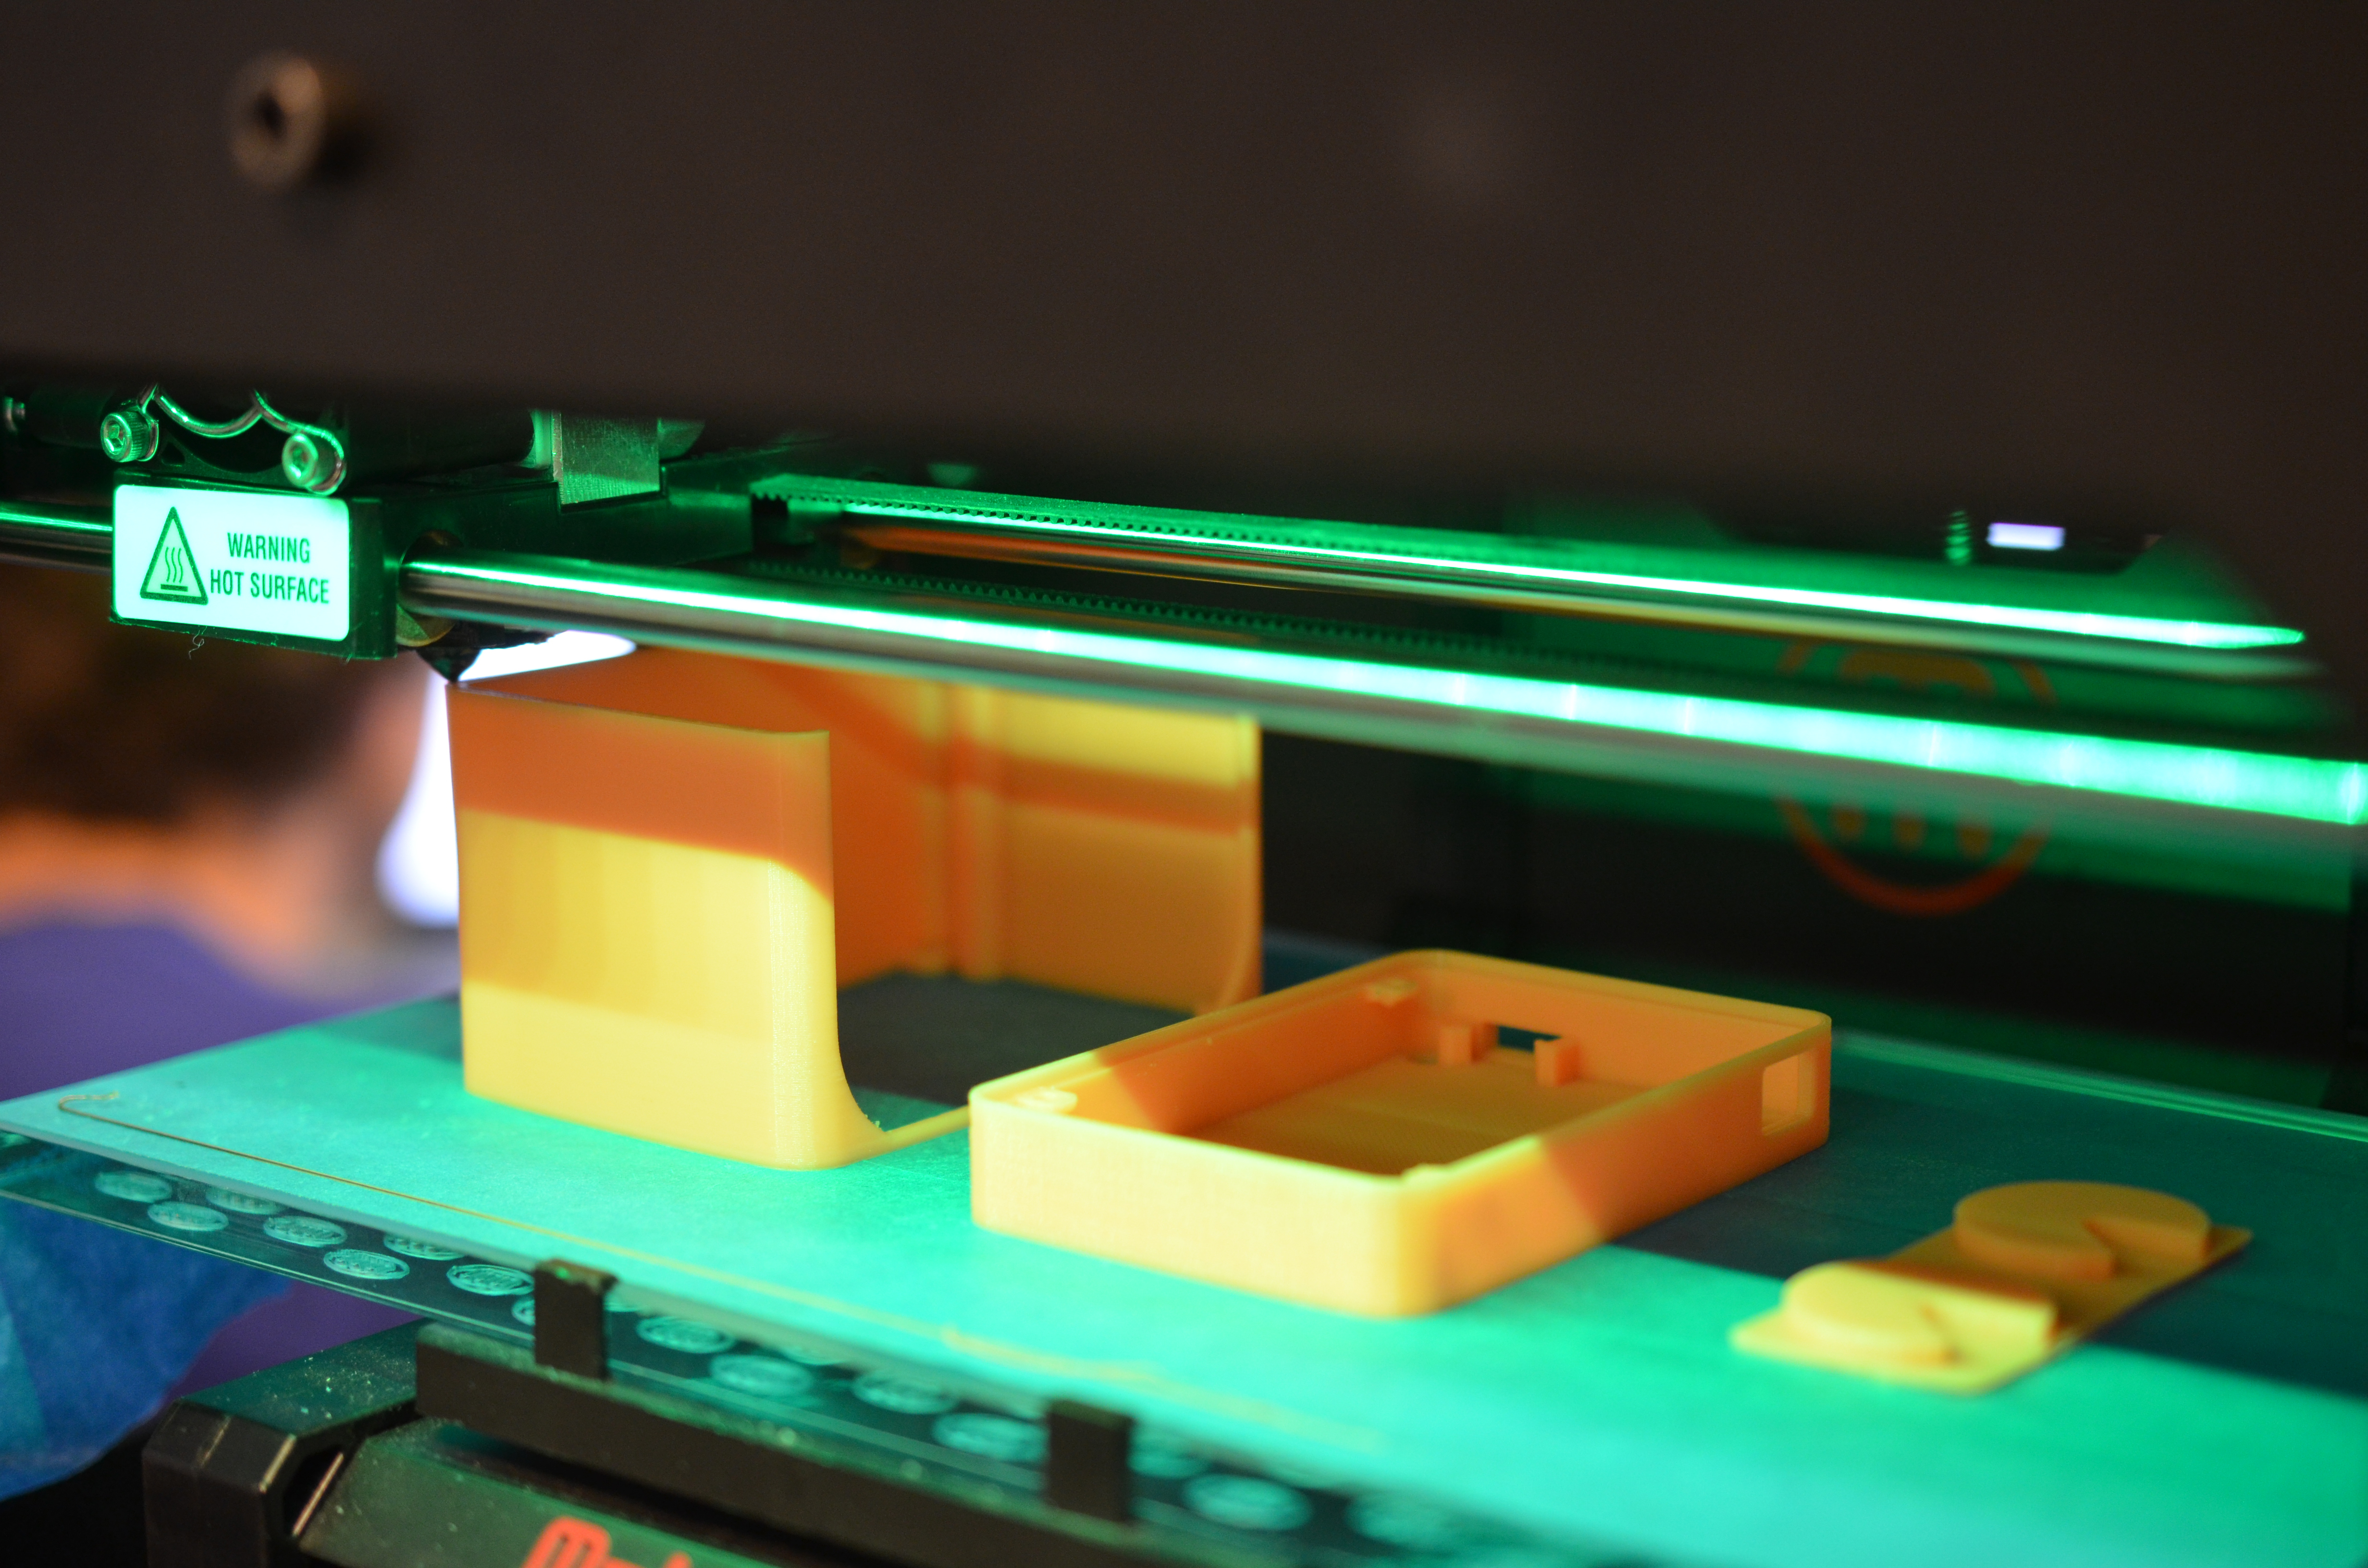 leds_uv-manicure-lamp-printing-parts.jpg